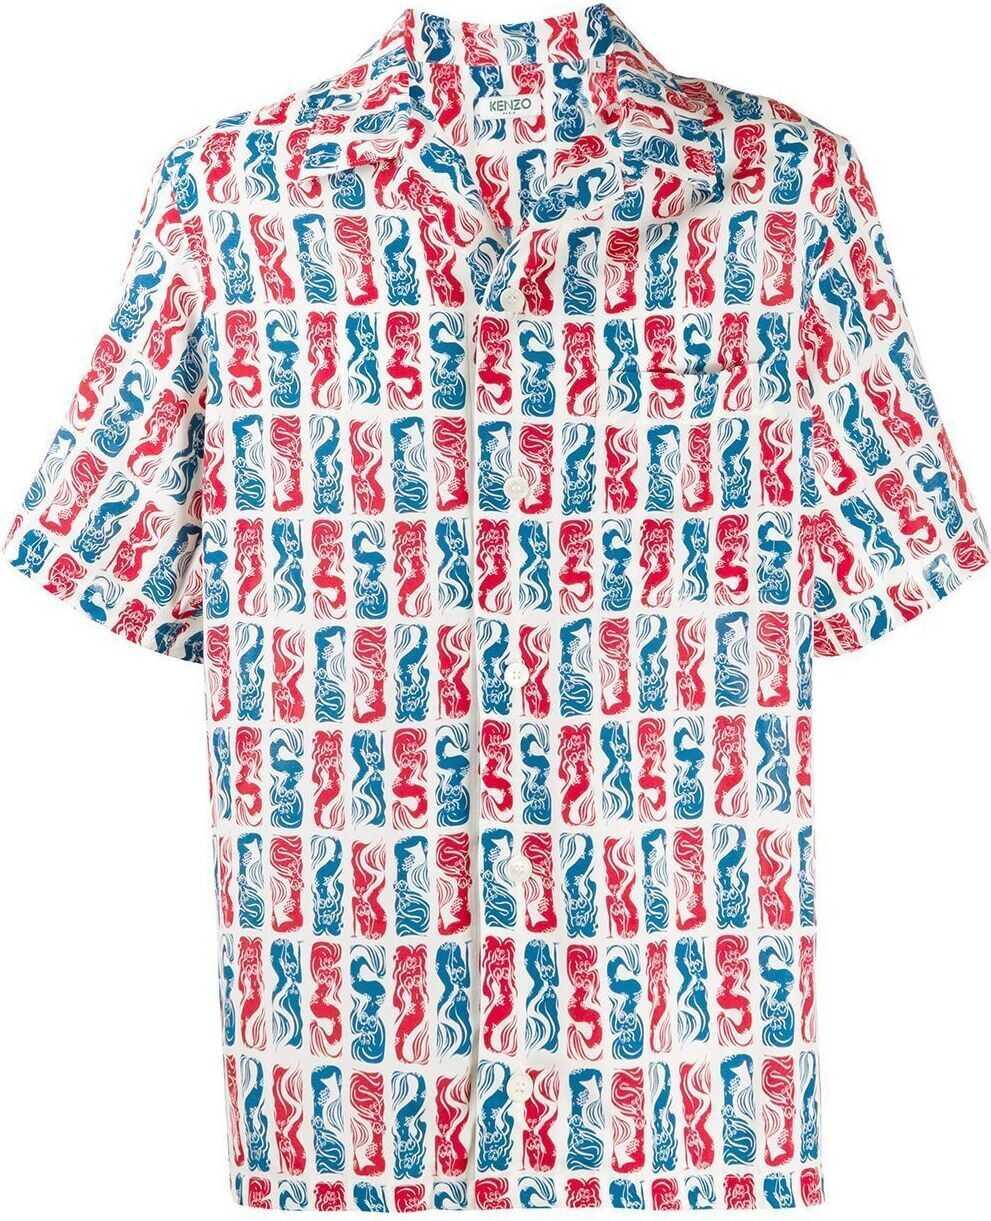 Kenzo Viscose Shirt MULTICOLOR